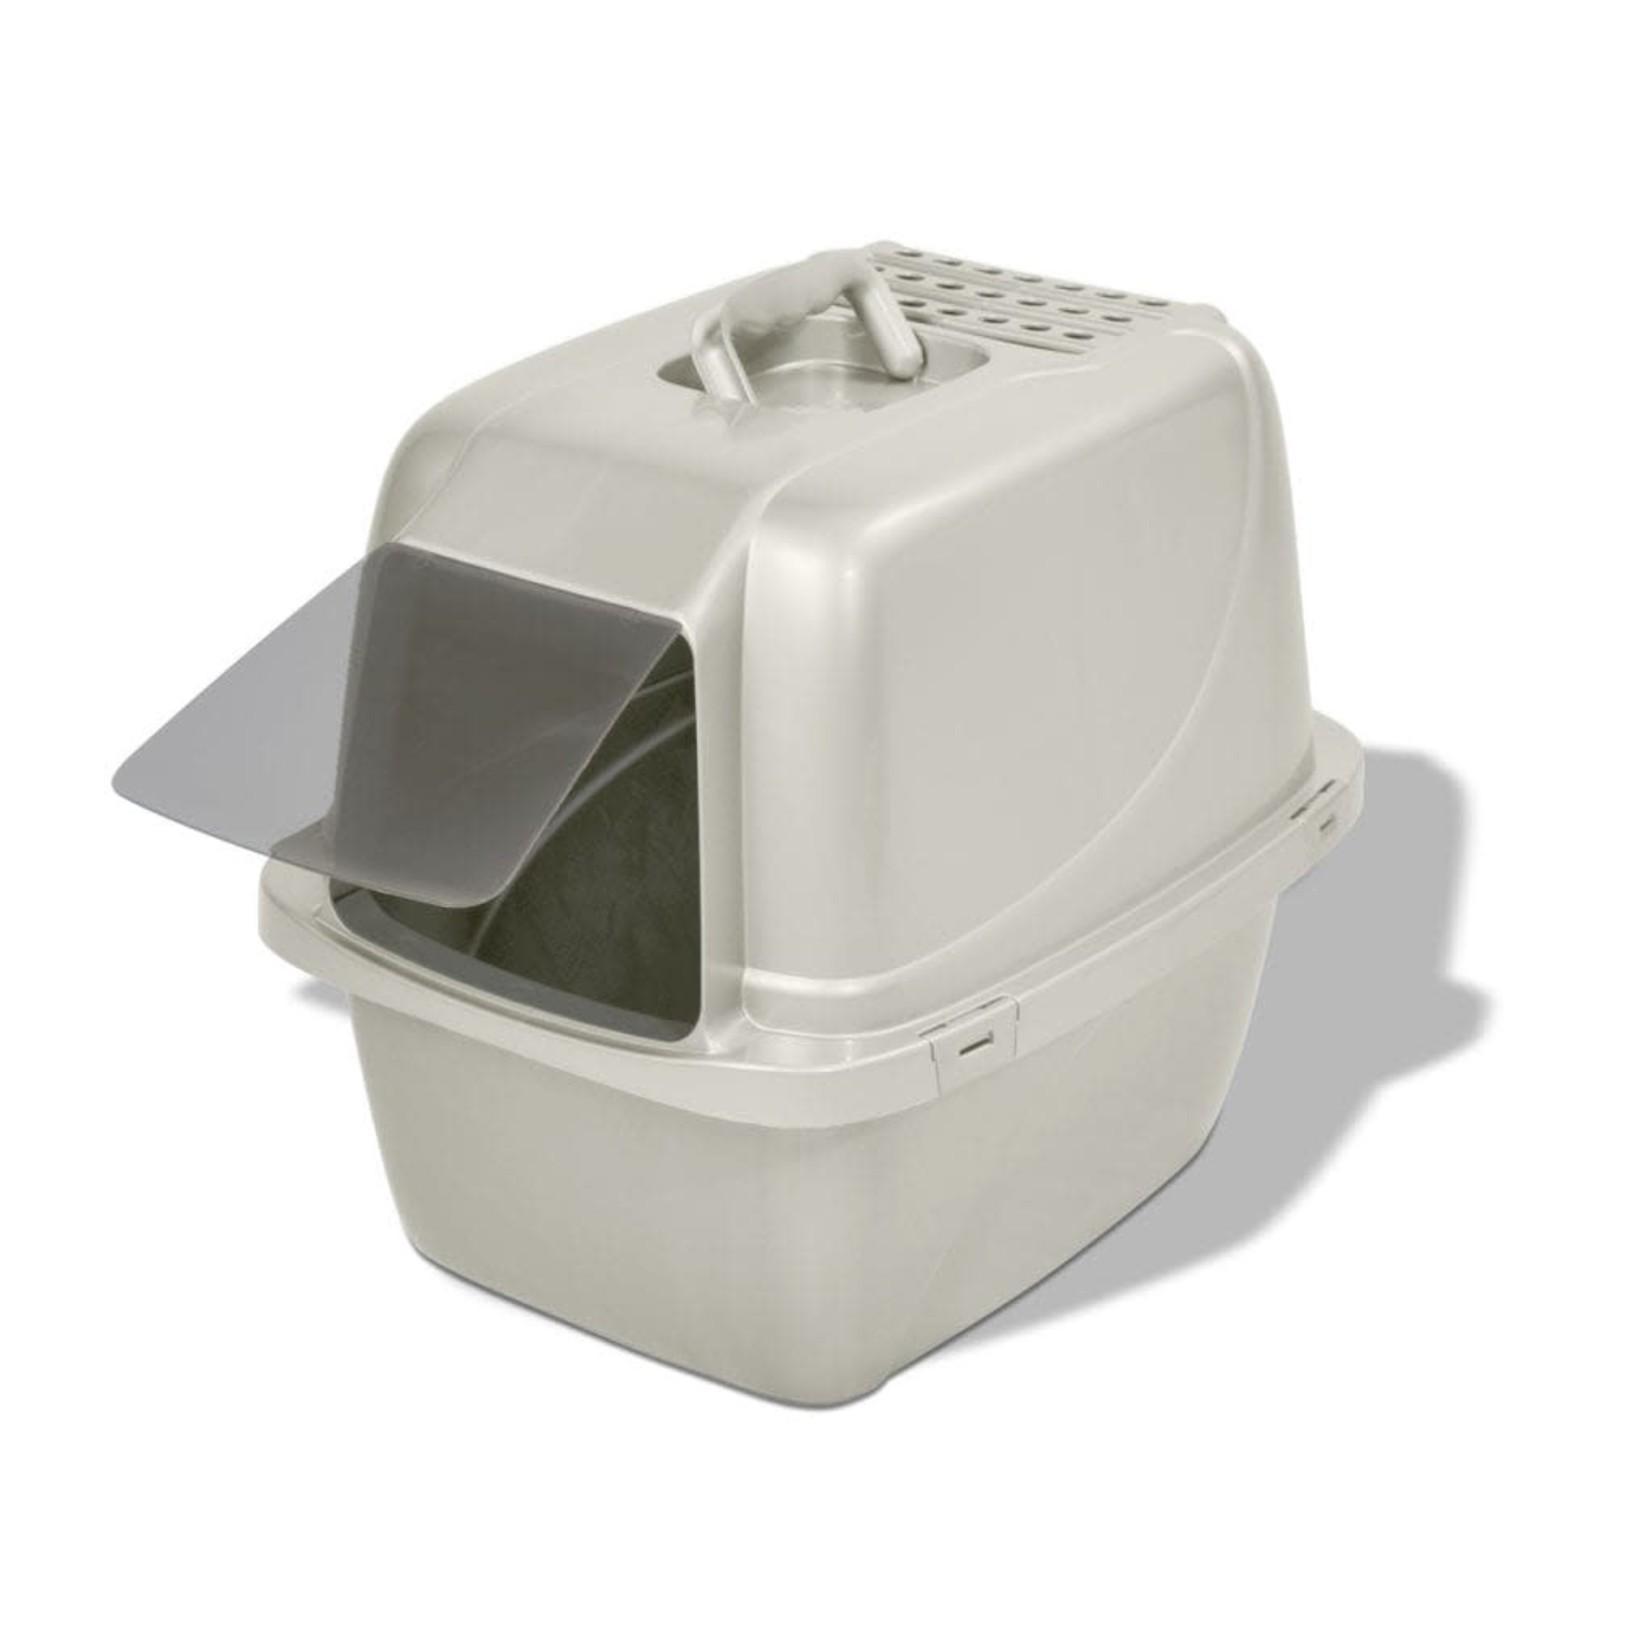 "Van ness Enclosed litter pan L19x15x16"""